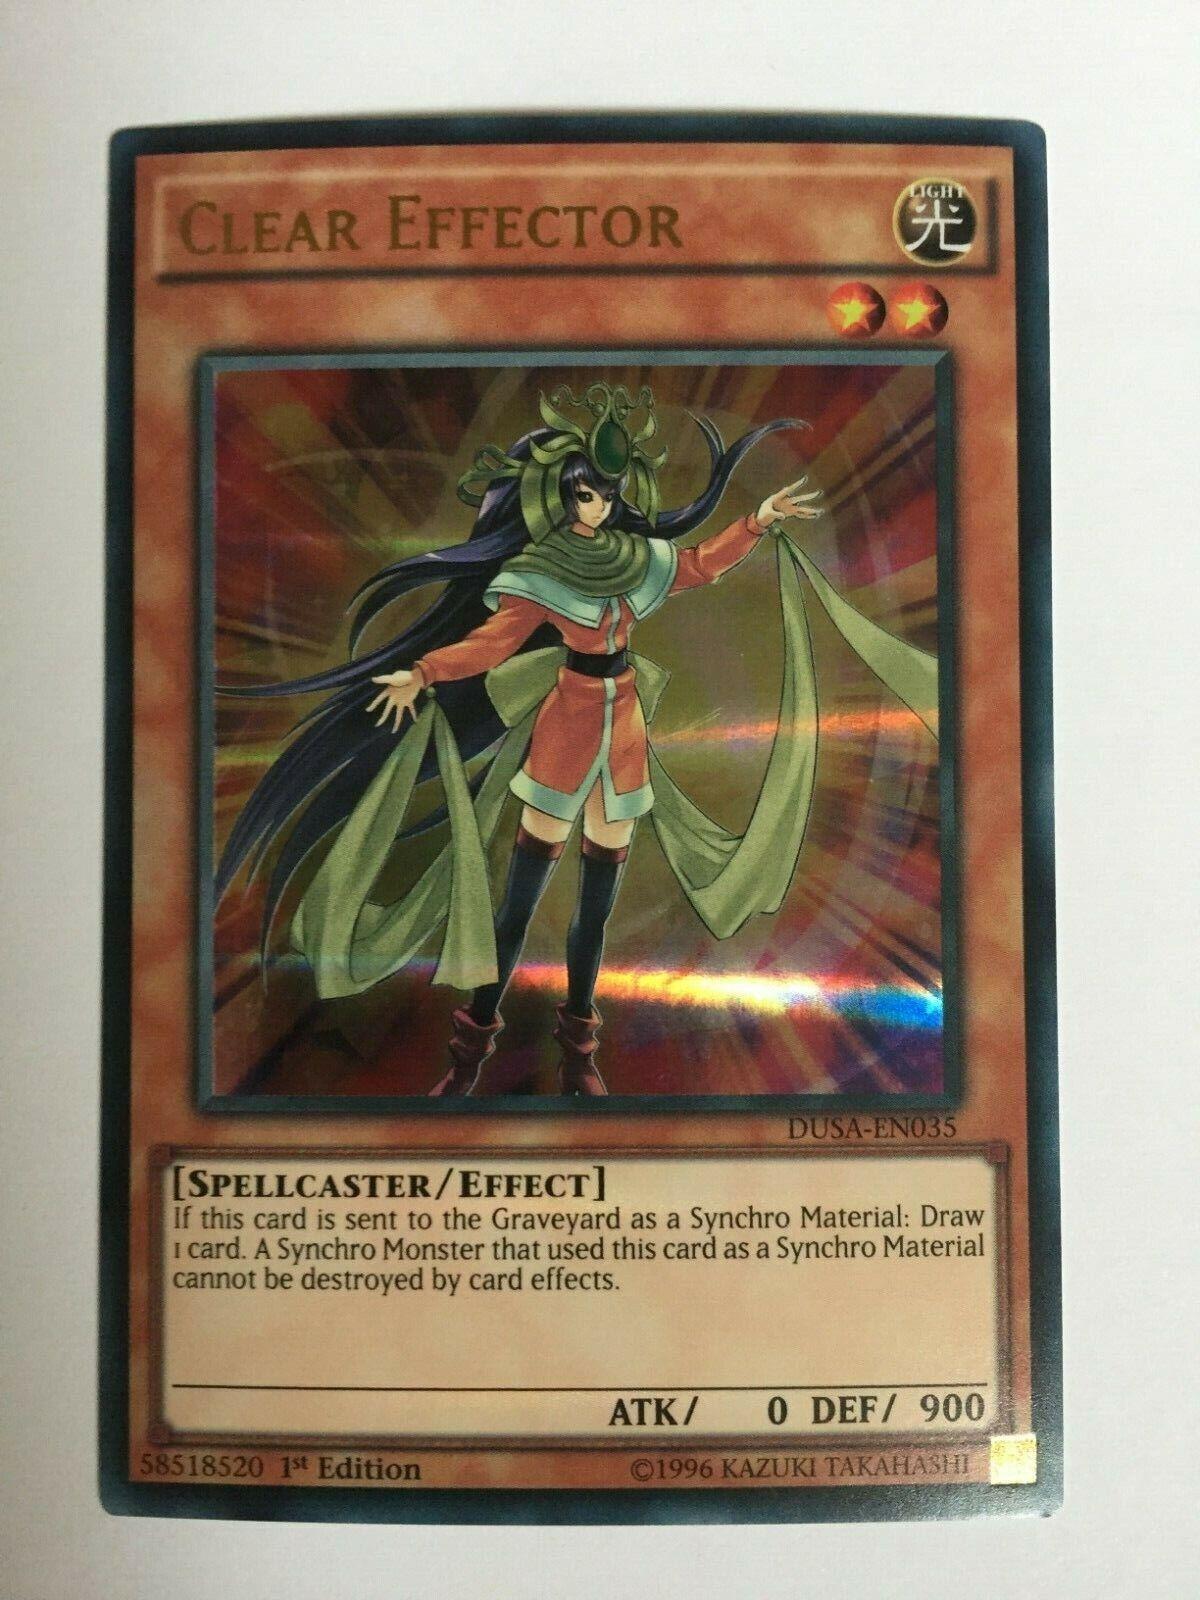 DUSA-EN035 - Ultra Rare Near Mint Clear Effector 1st Edition